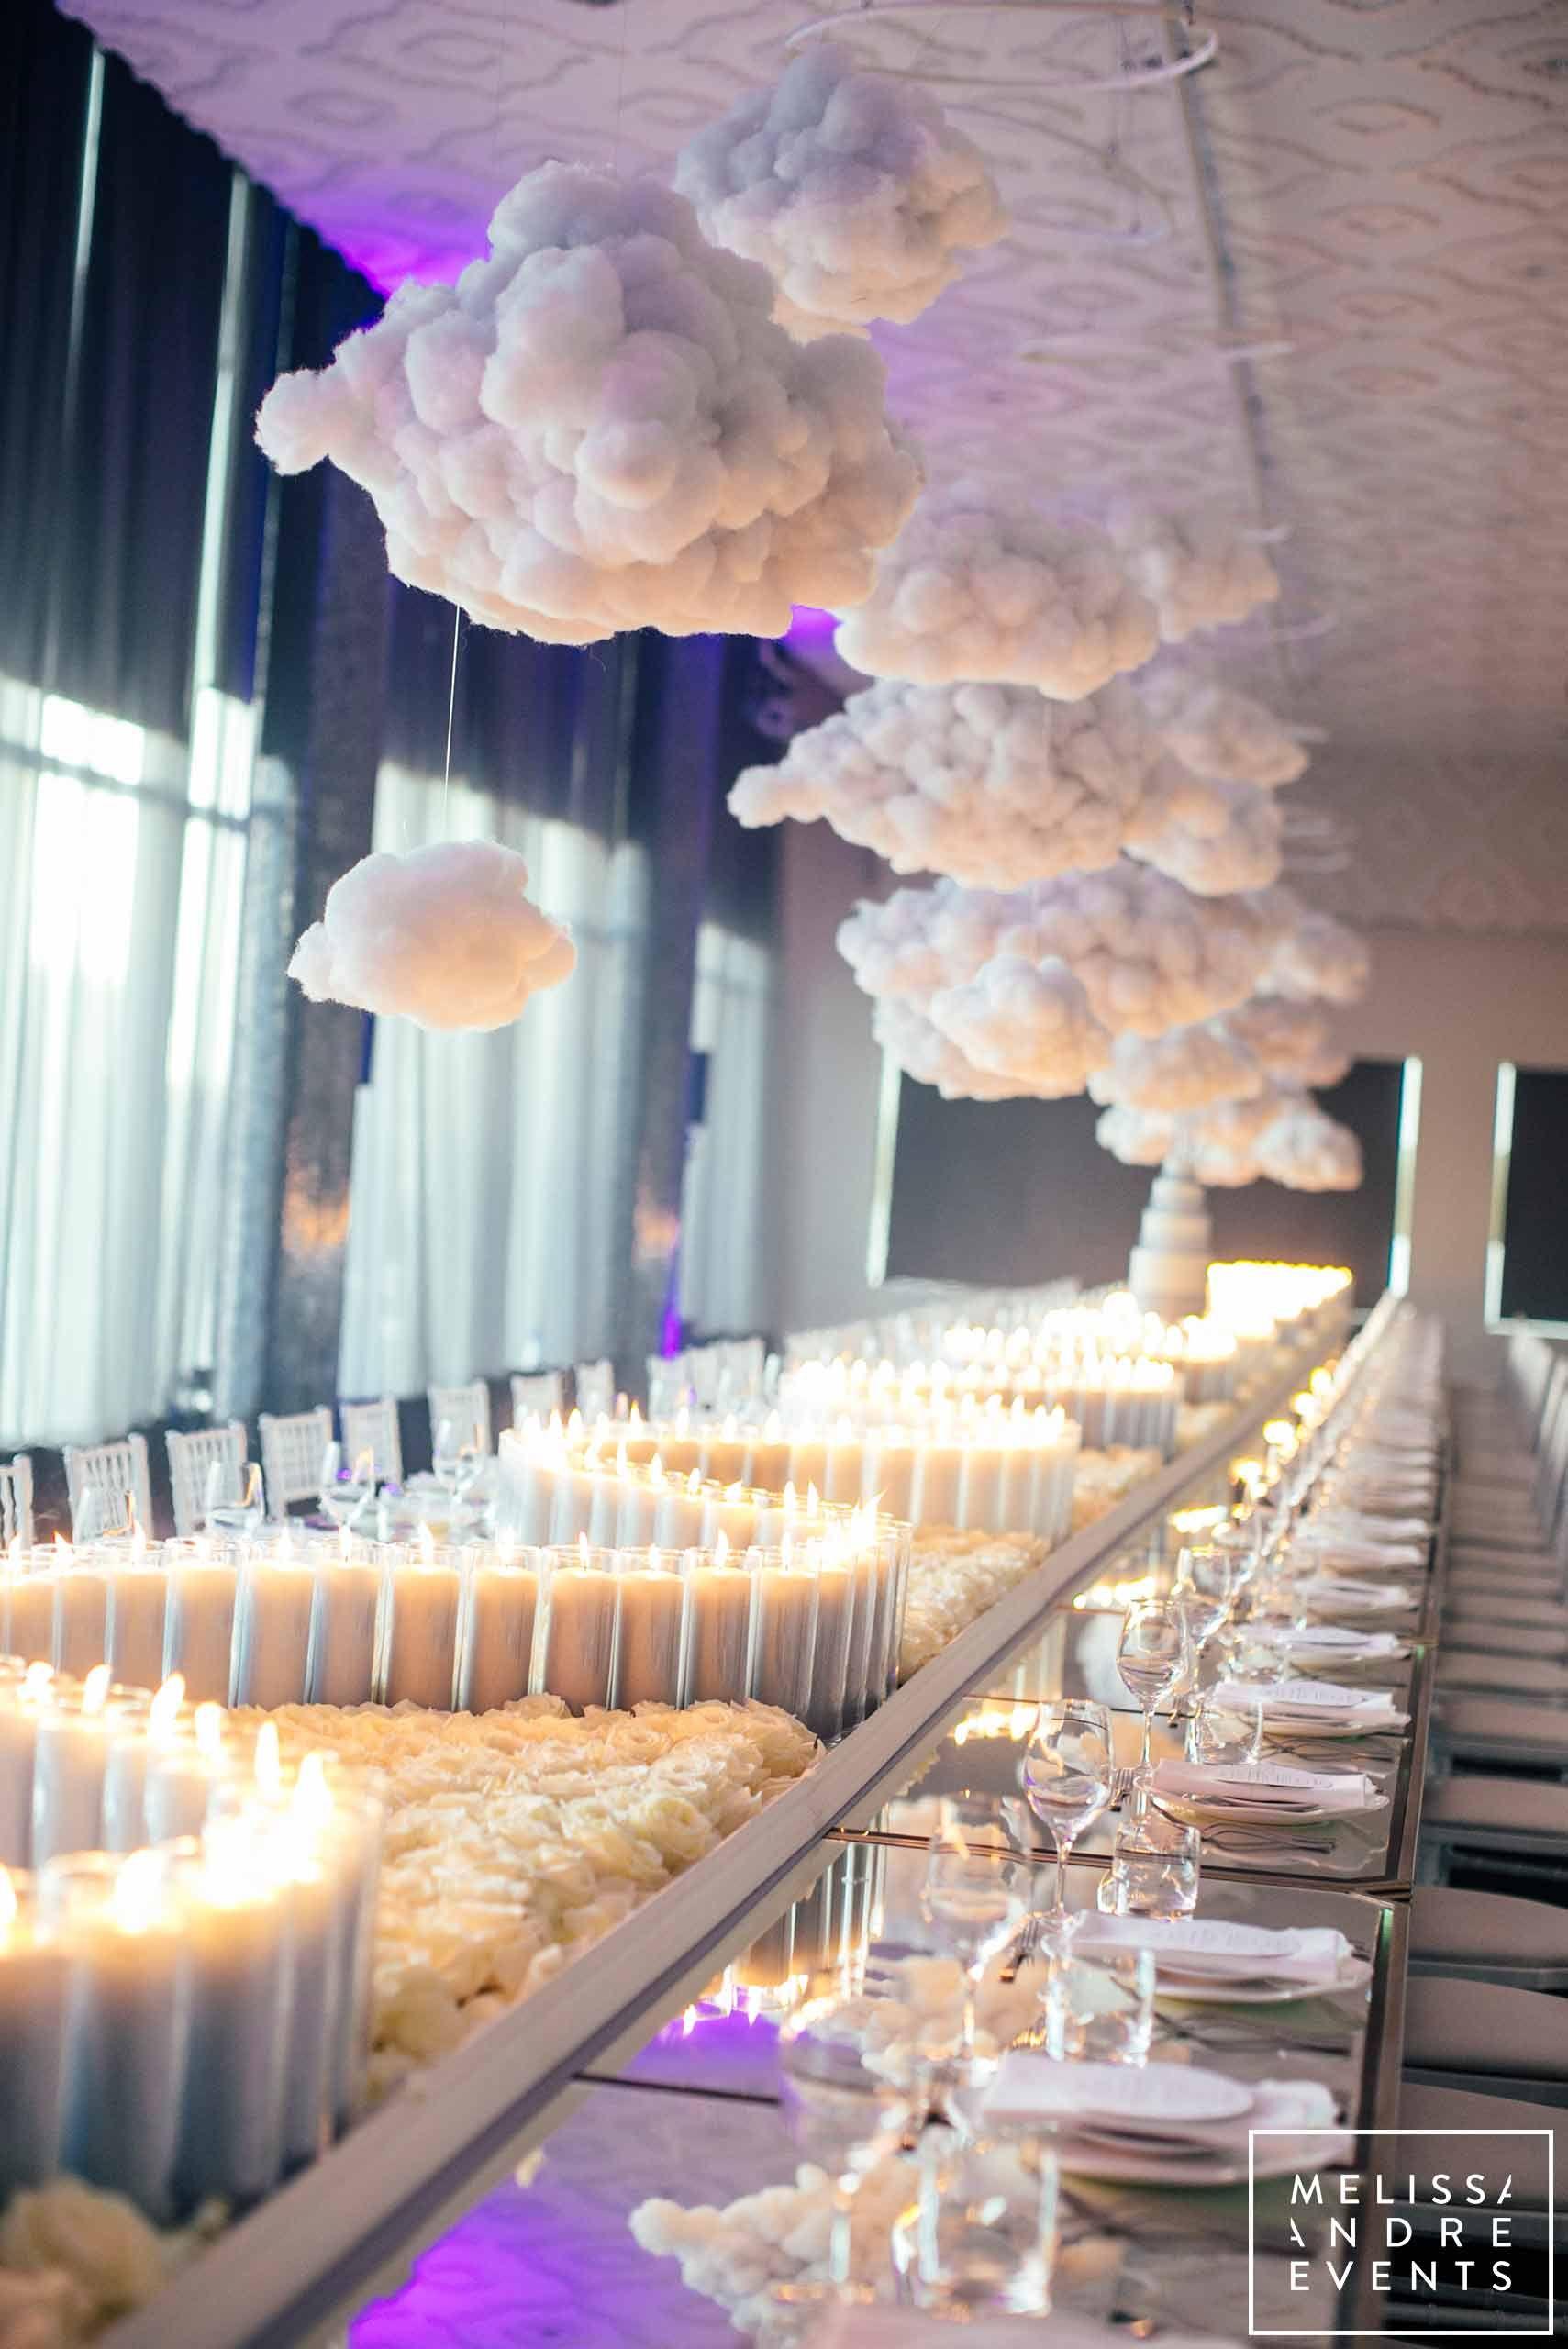 Melissa Andre Events Custom Design Tablescape Cloud White